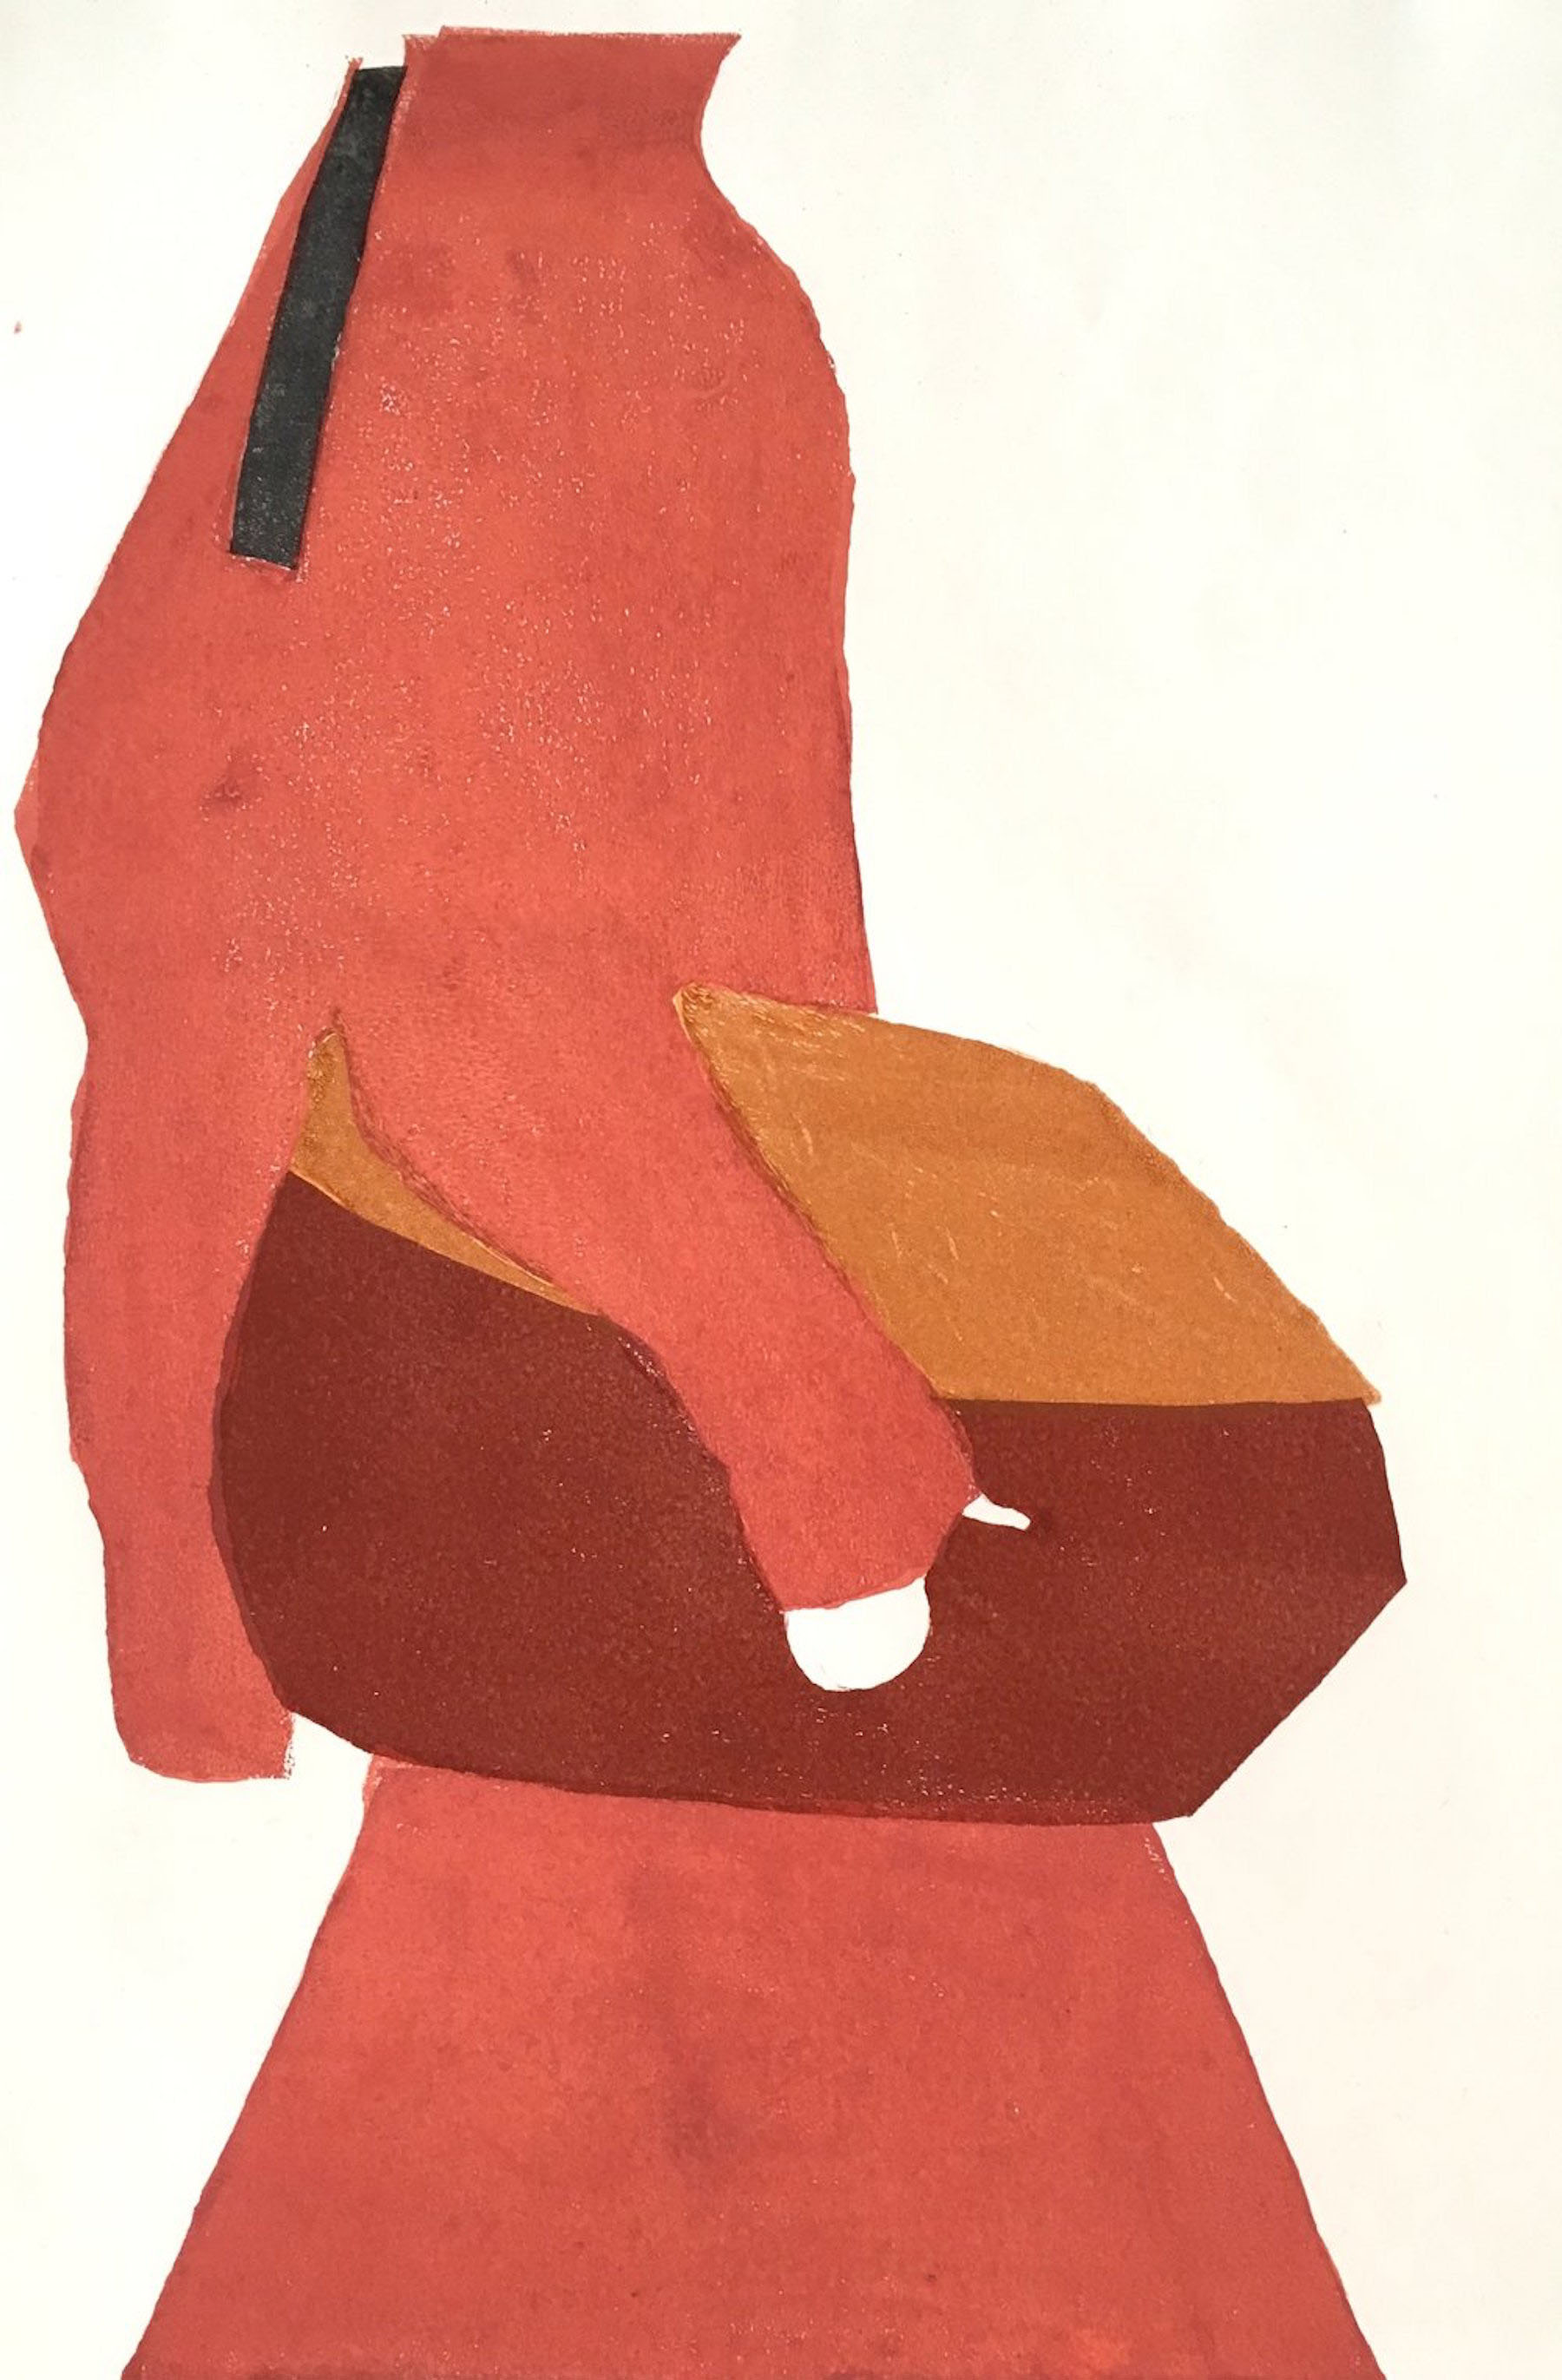 iGNANT-Art-Renee-Gouin-05